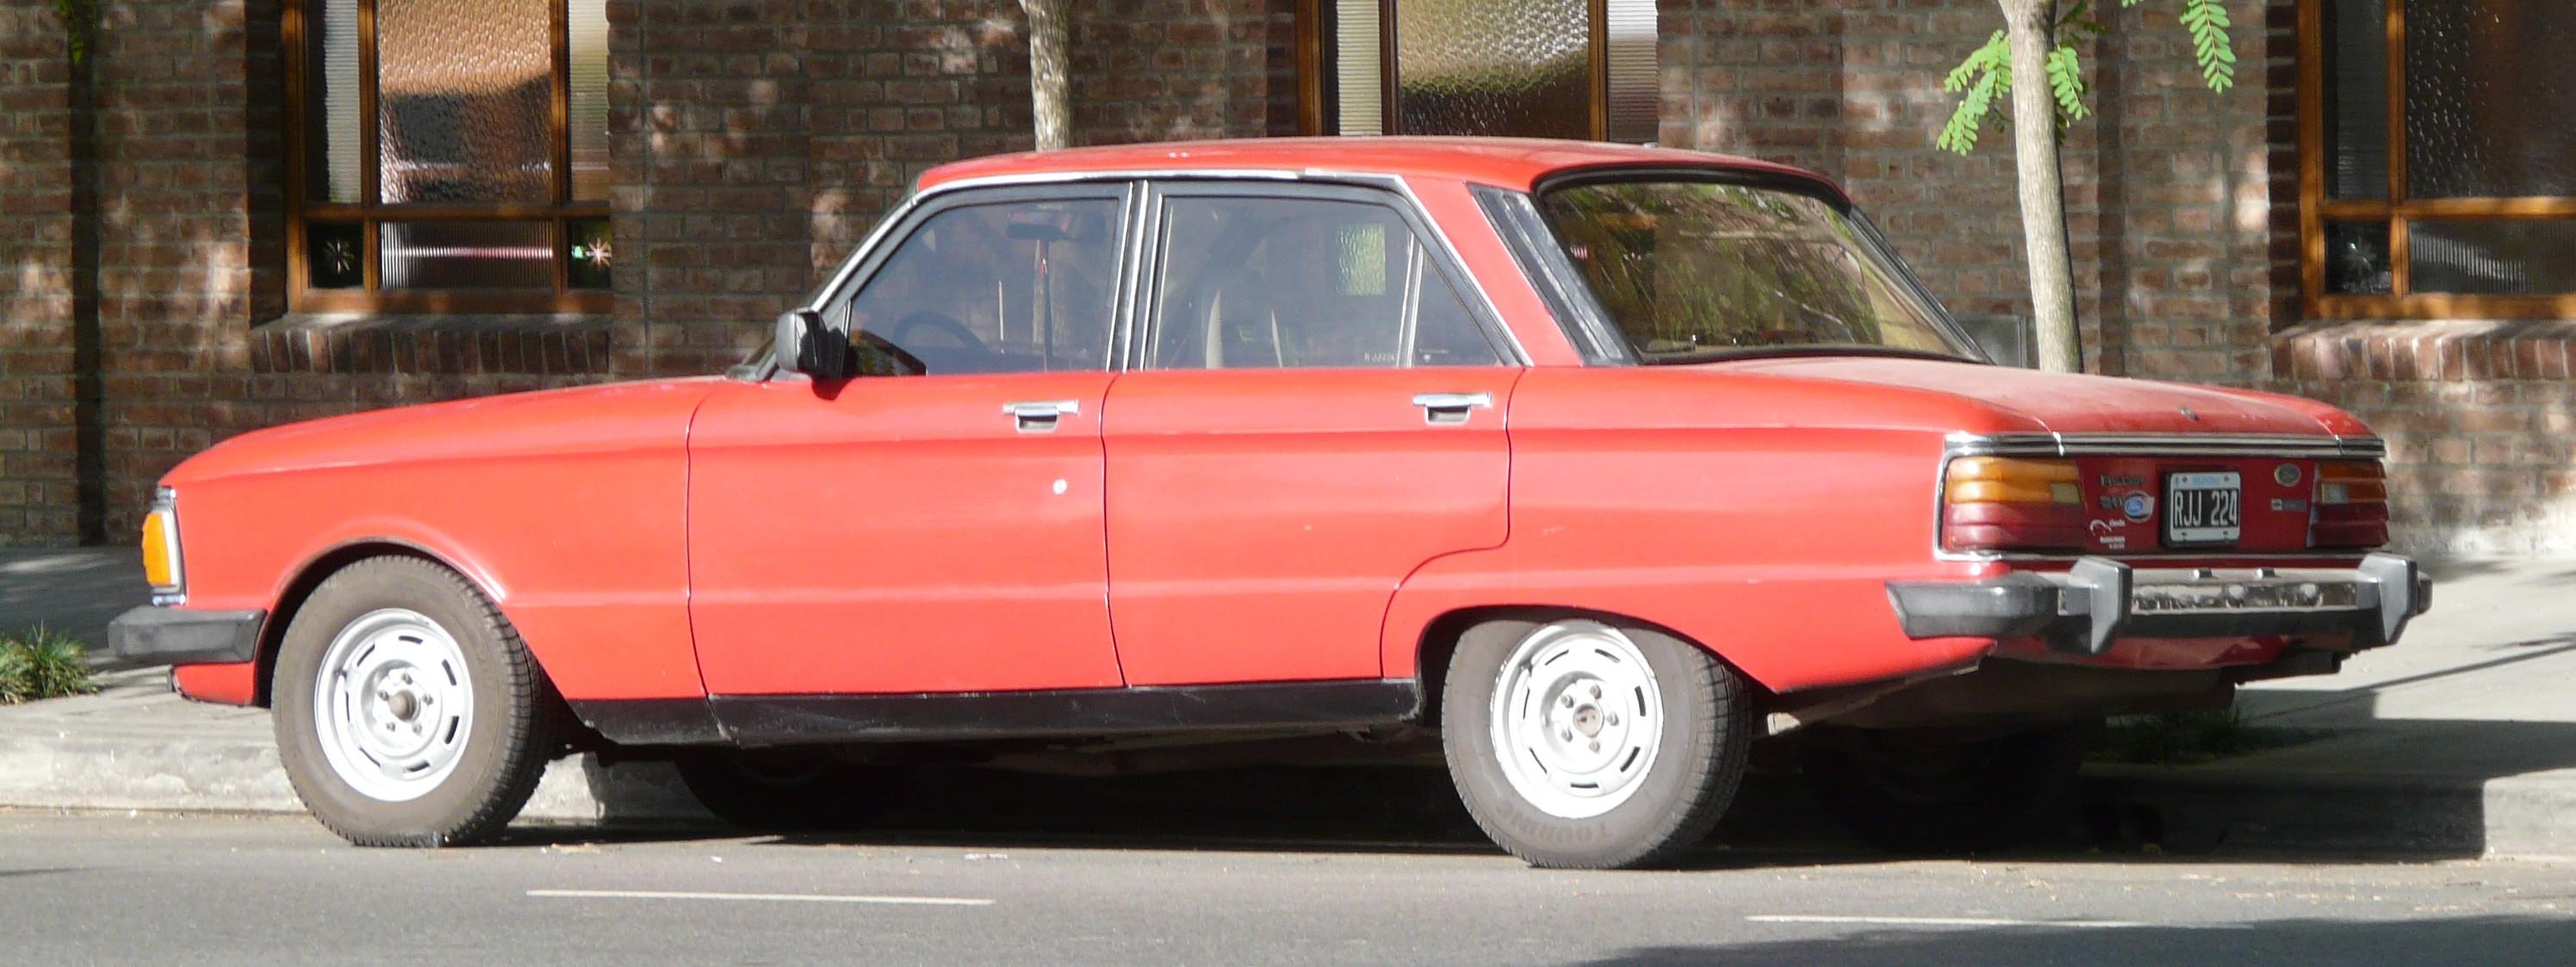 File Ford Falcon Argentina Late Model Red Jpg Wikimedia